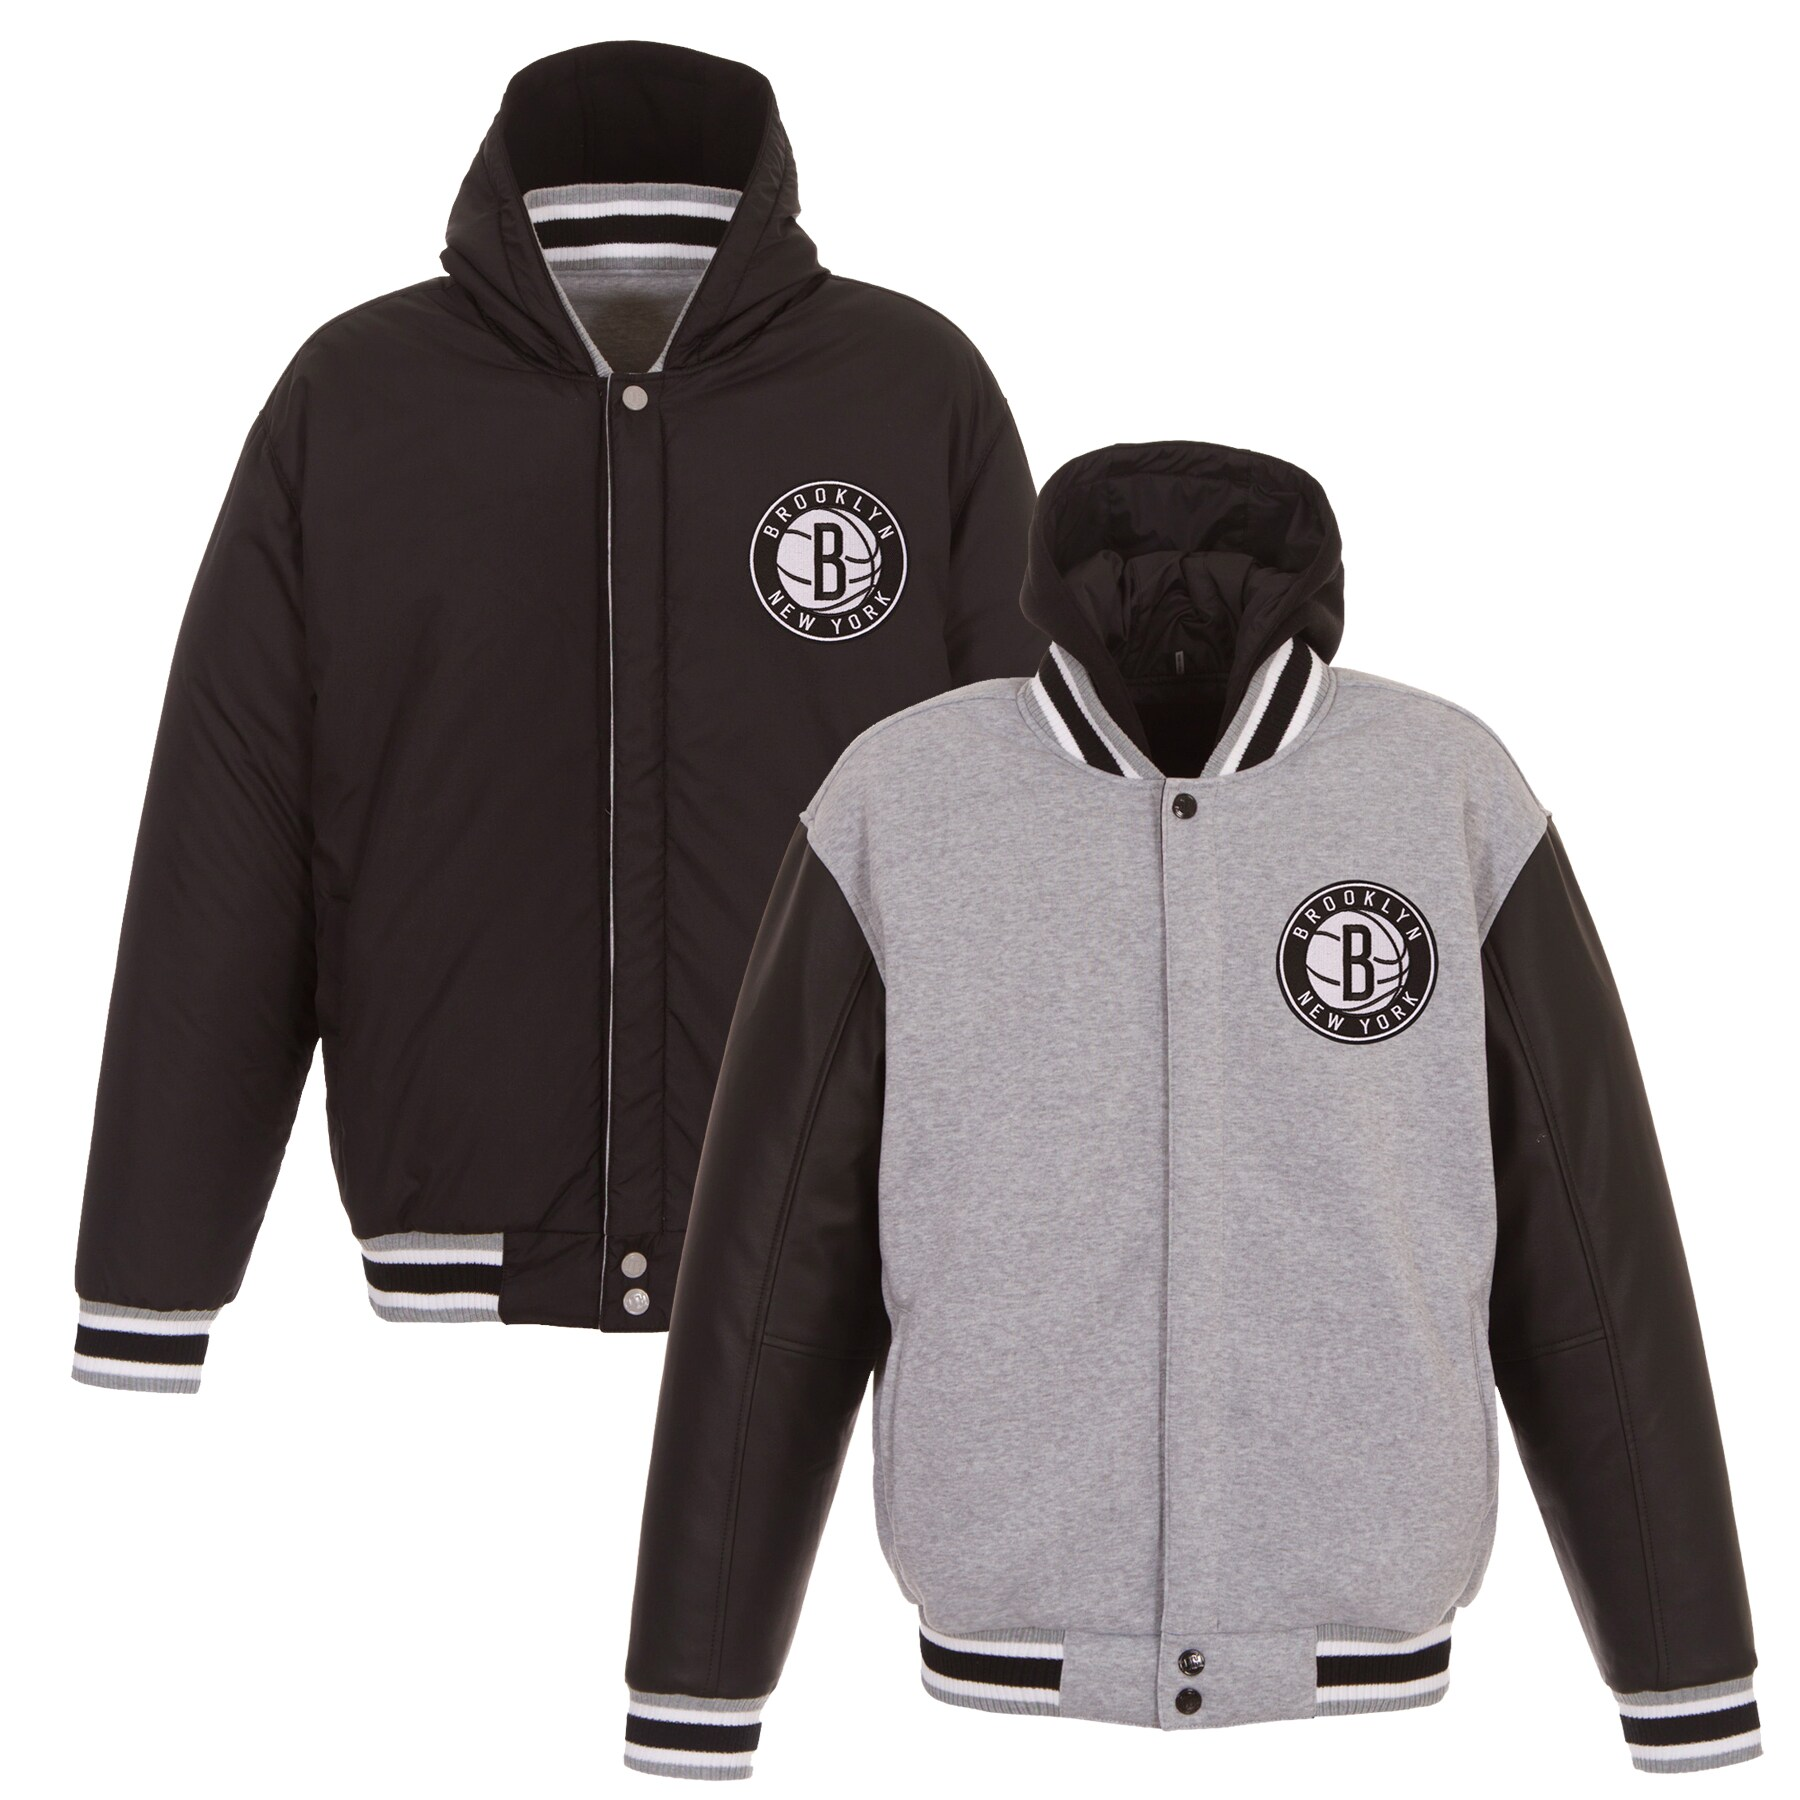 Brooklyn Nets JH Design Embroidered Logo Reversible Hooded Fleece Full-Snap Jacket - Gray/Black